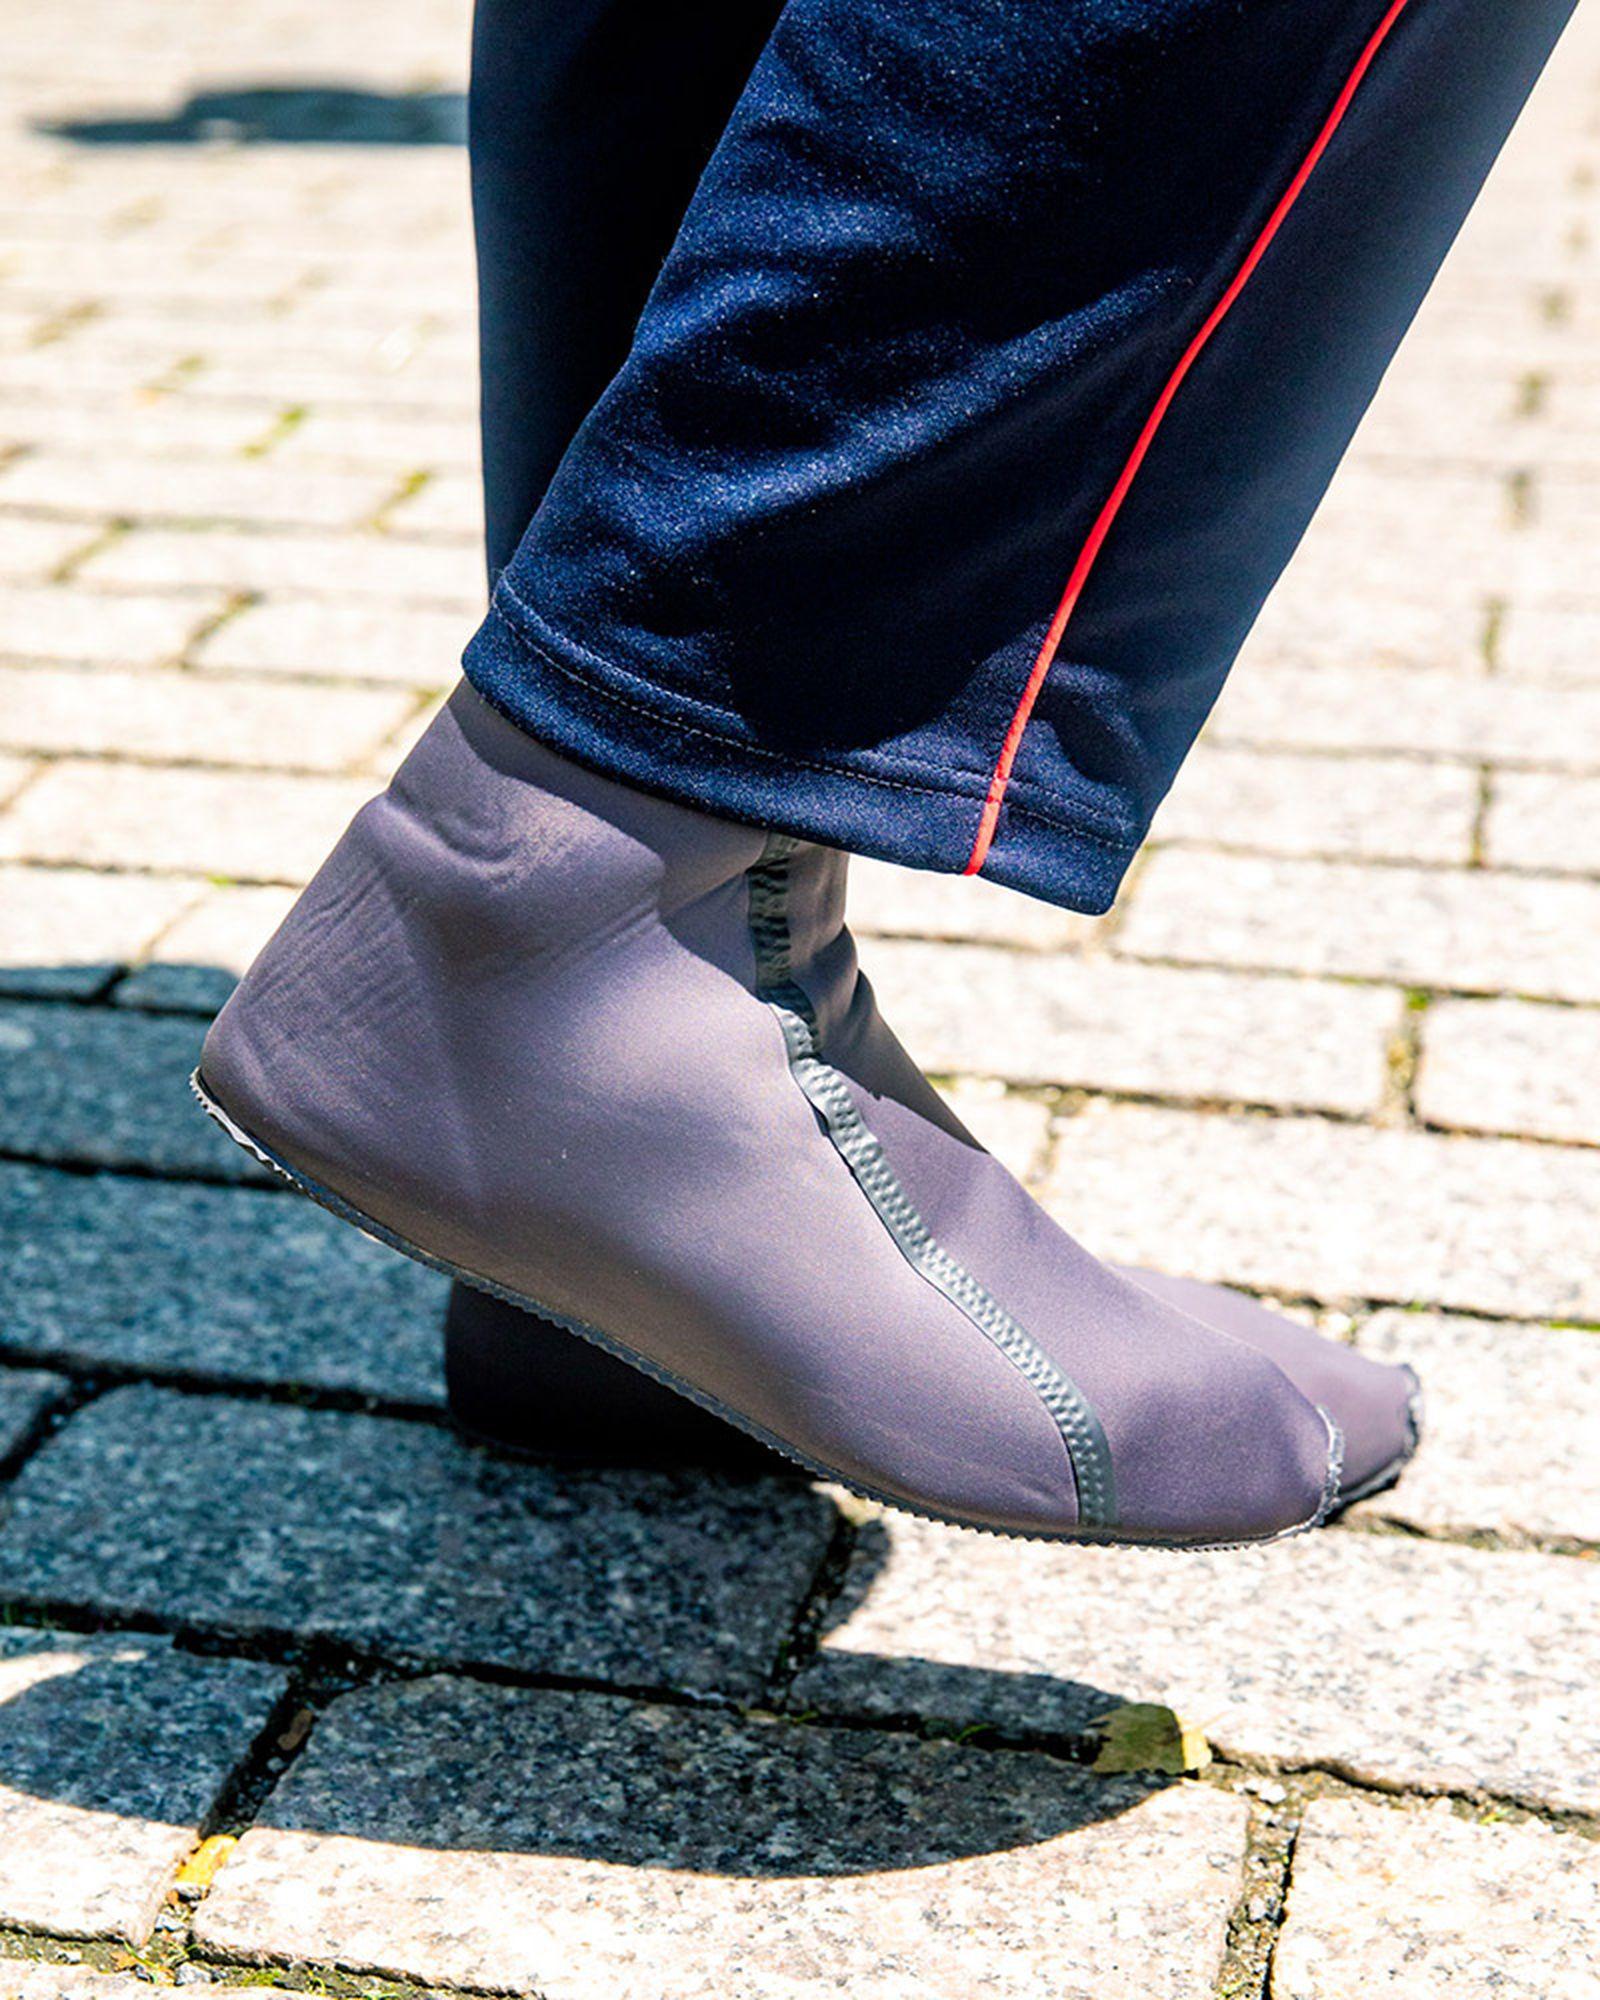 adidas yeezy scuba release date price kanye west